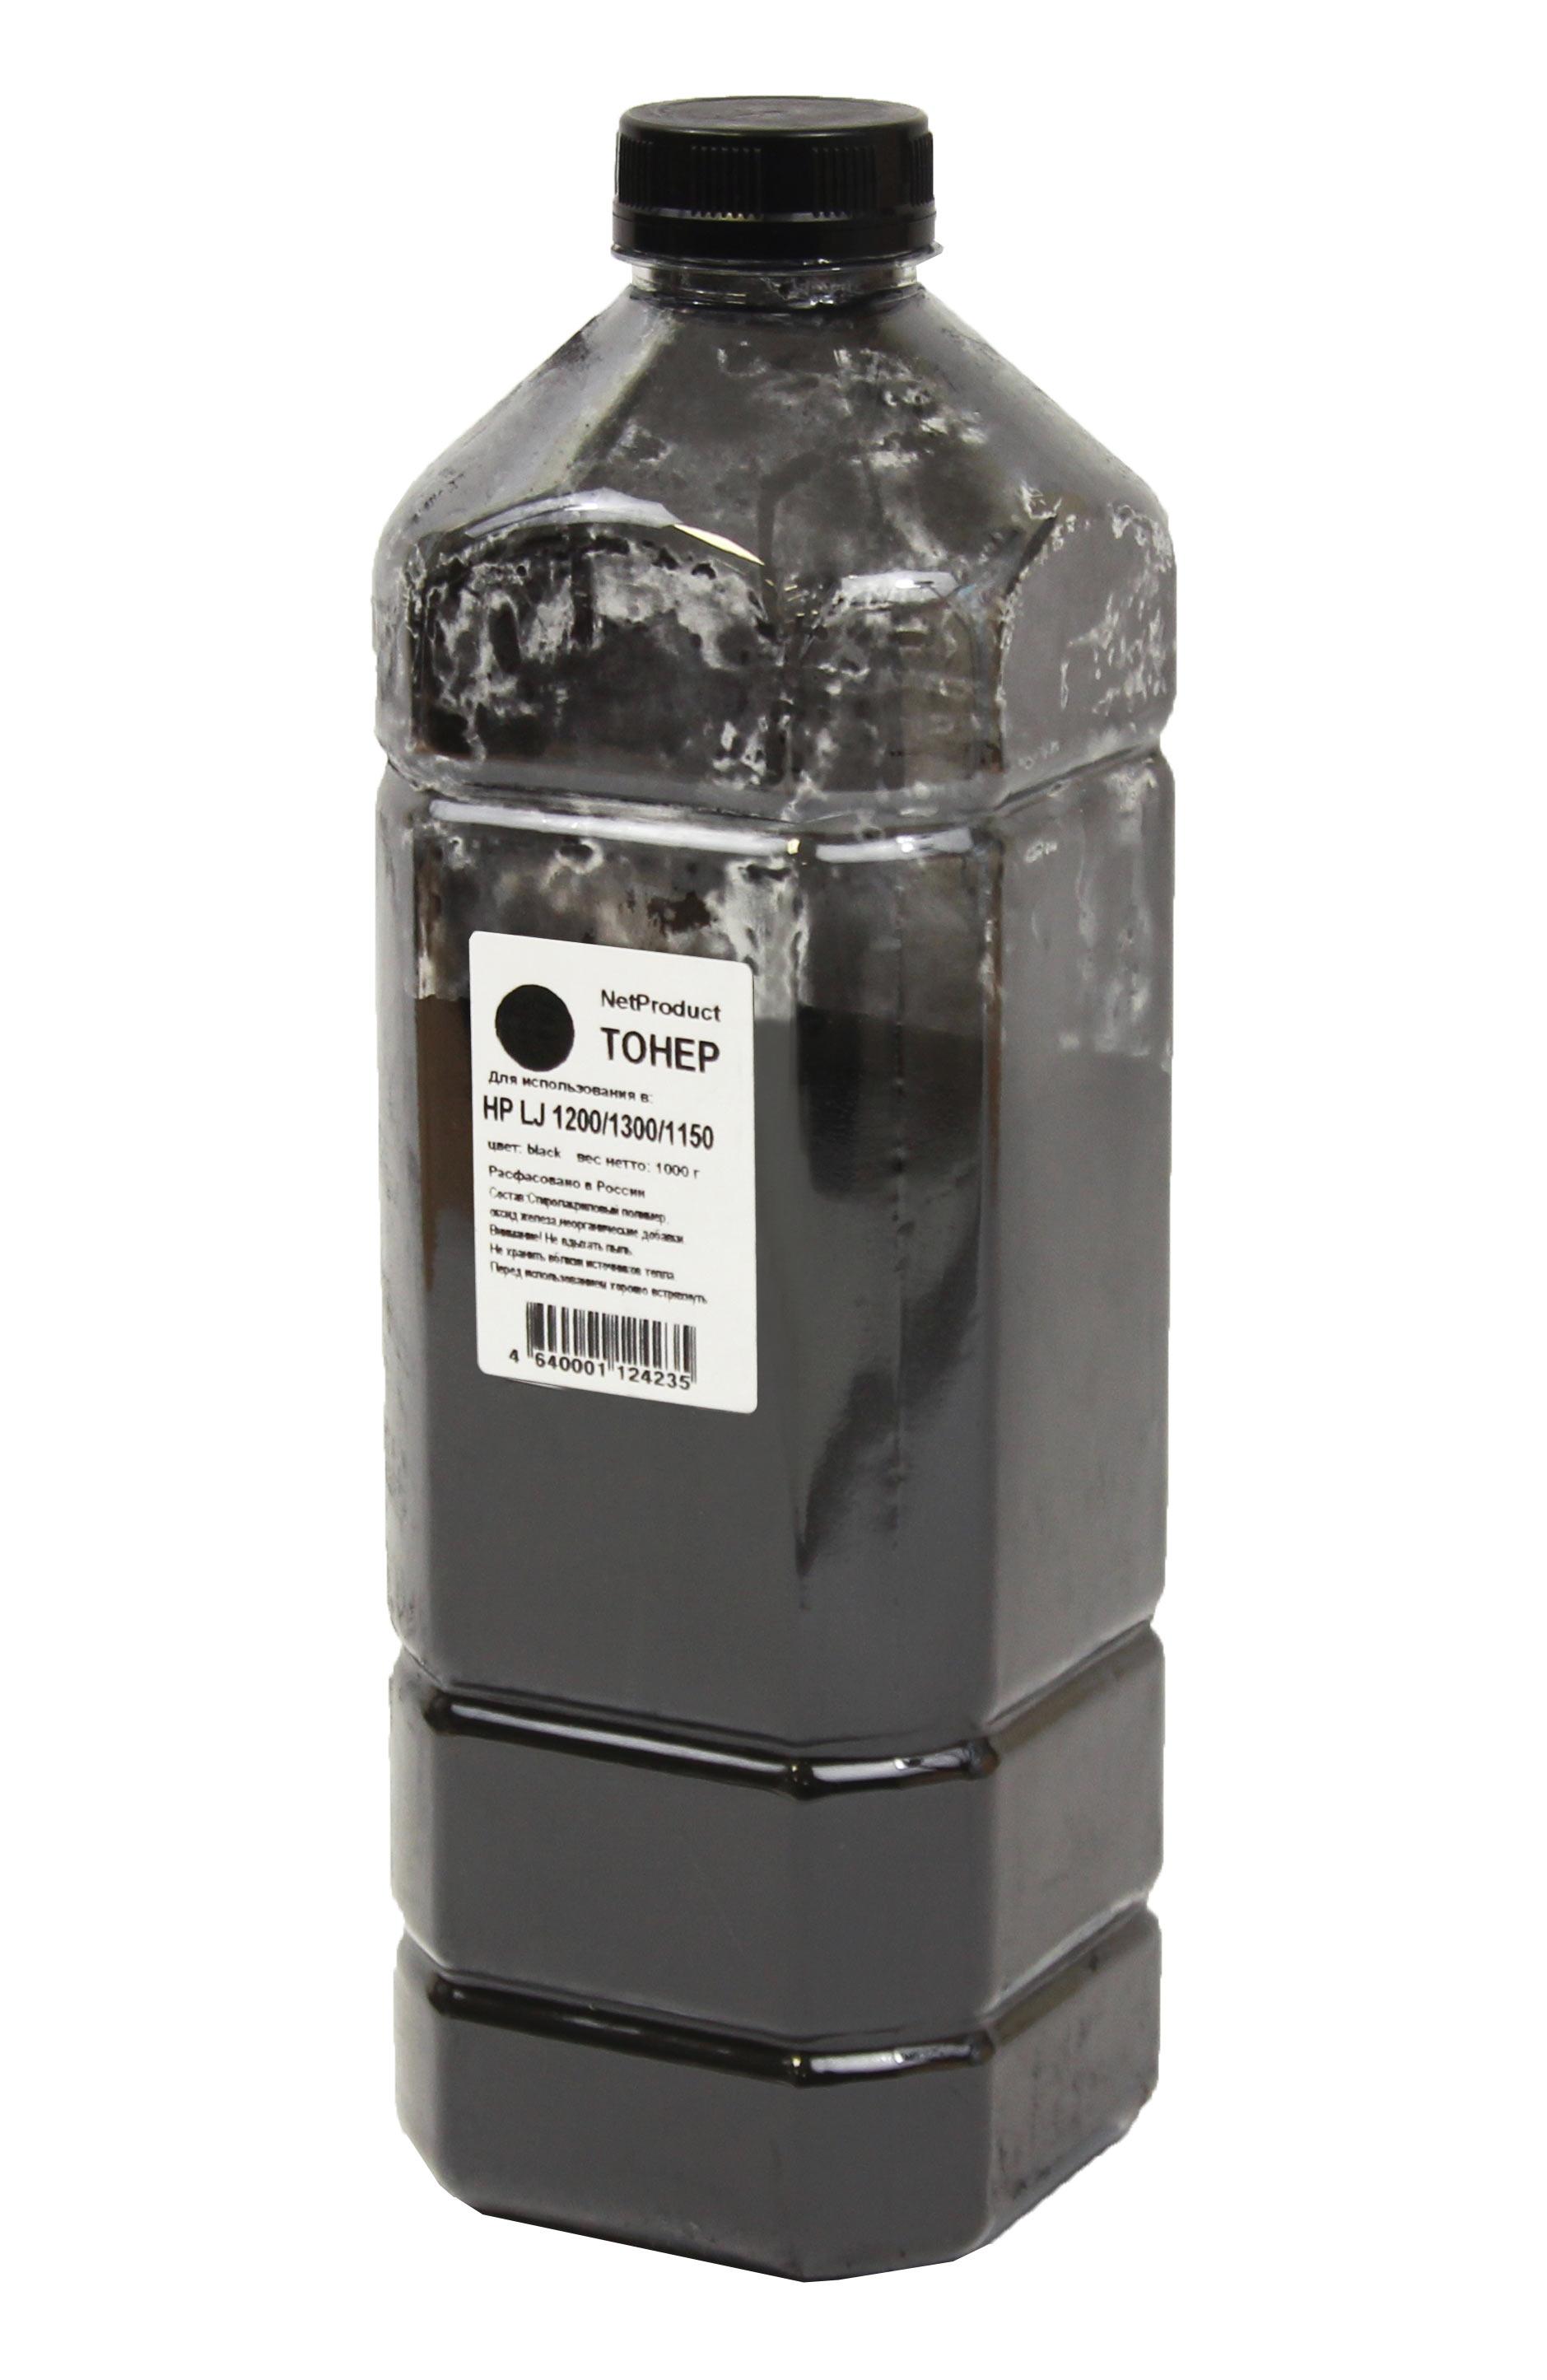 Тонер NetProduct для HP LJ 1200/1300/1150, Bk, 1 кг, канистра